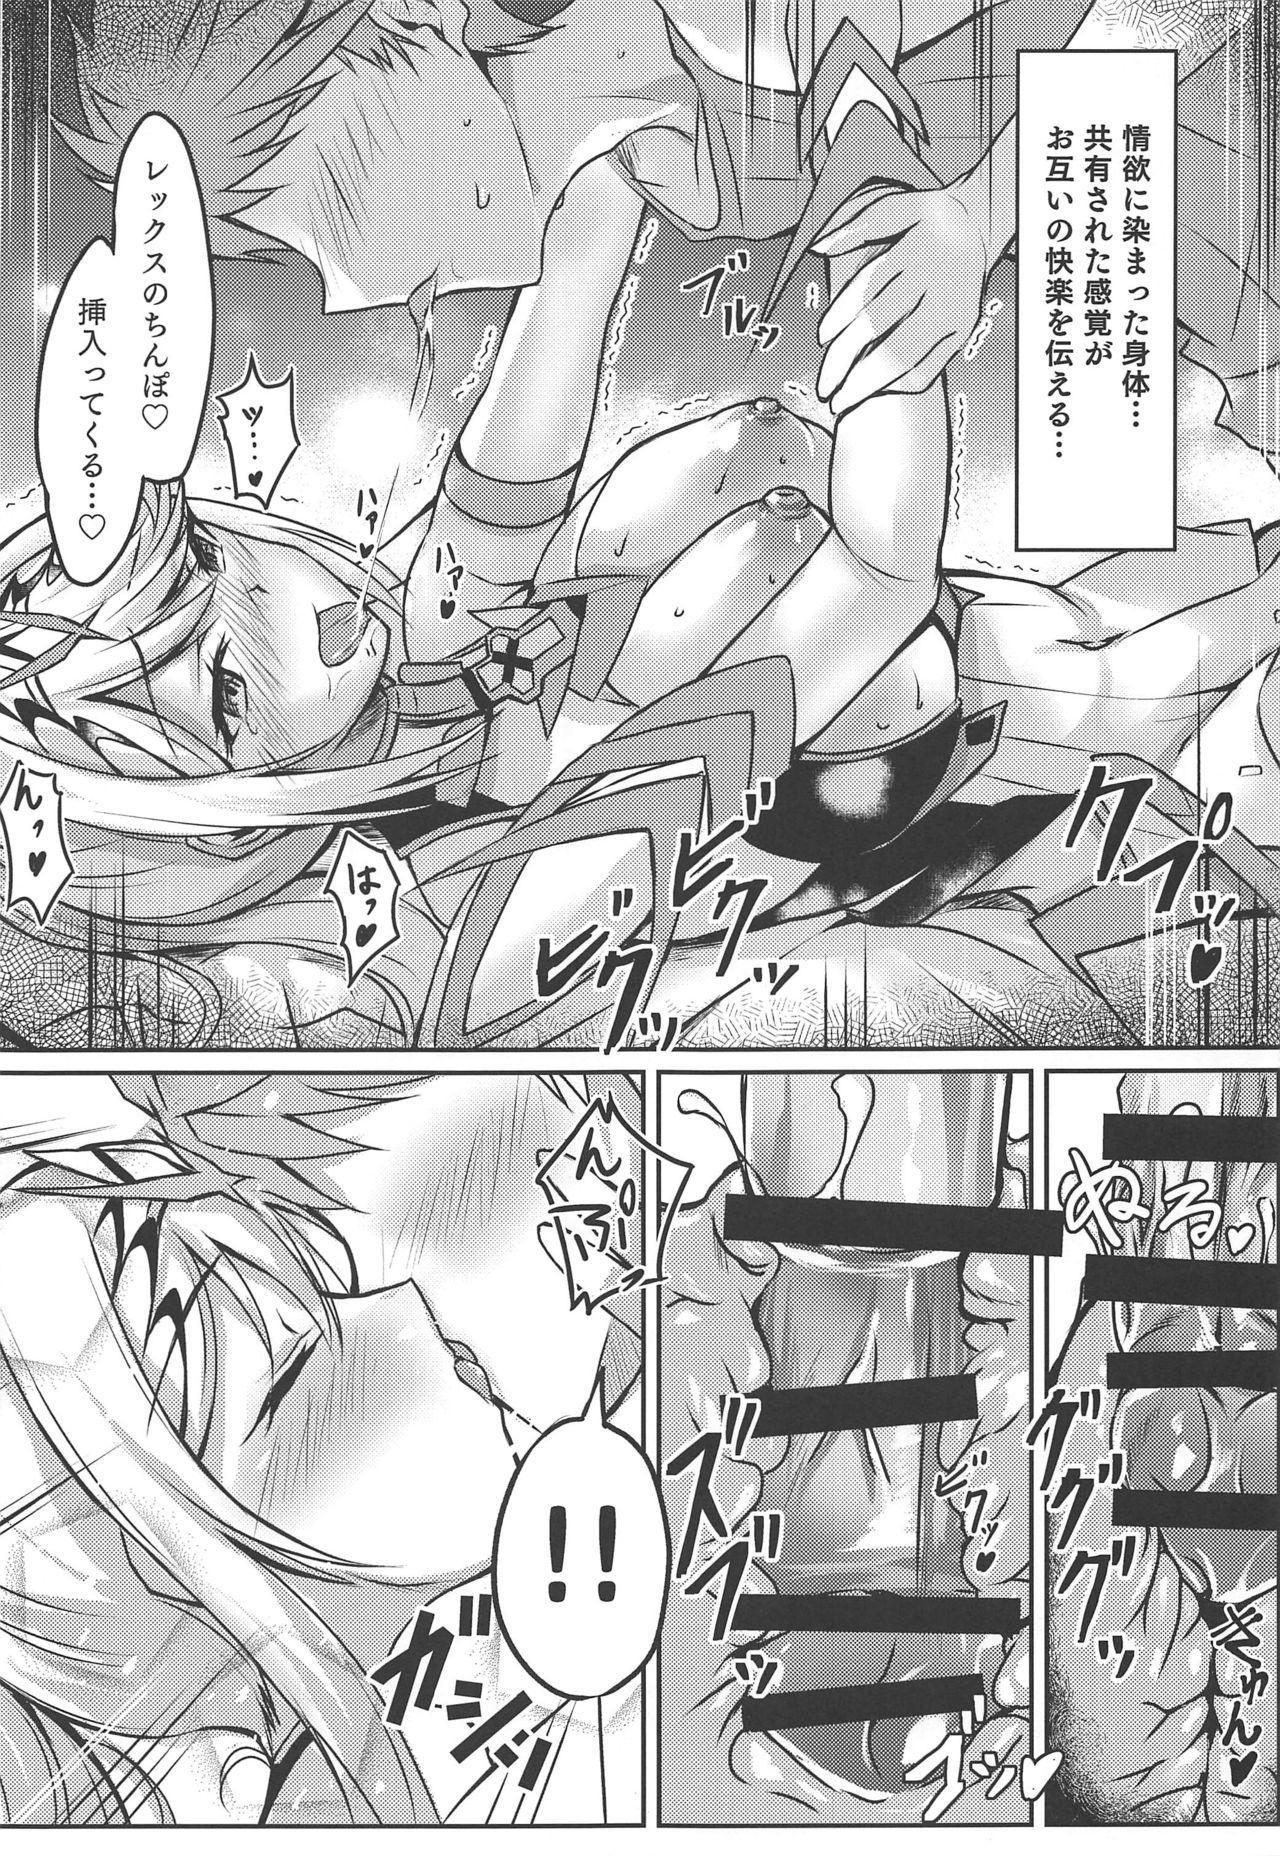 Hikari-chan no Ecchi Hon 17